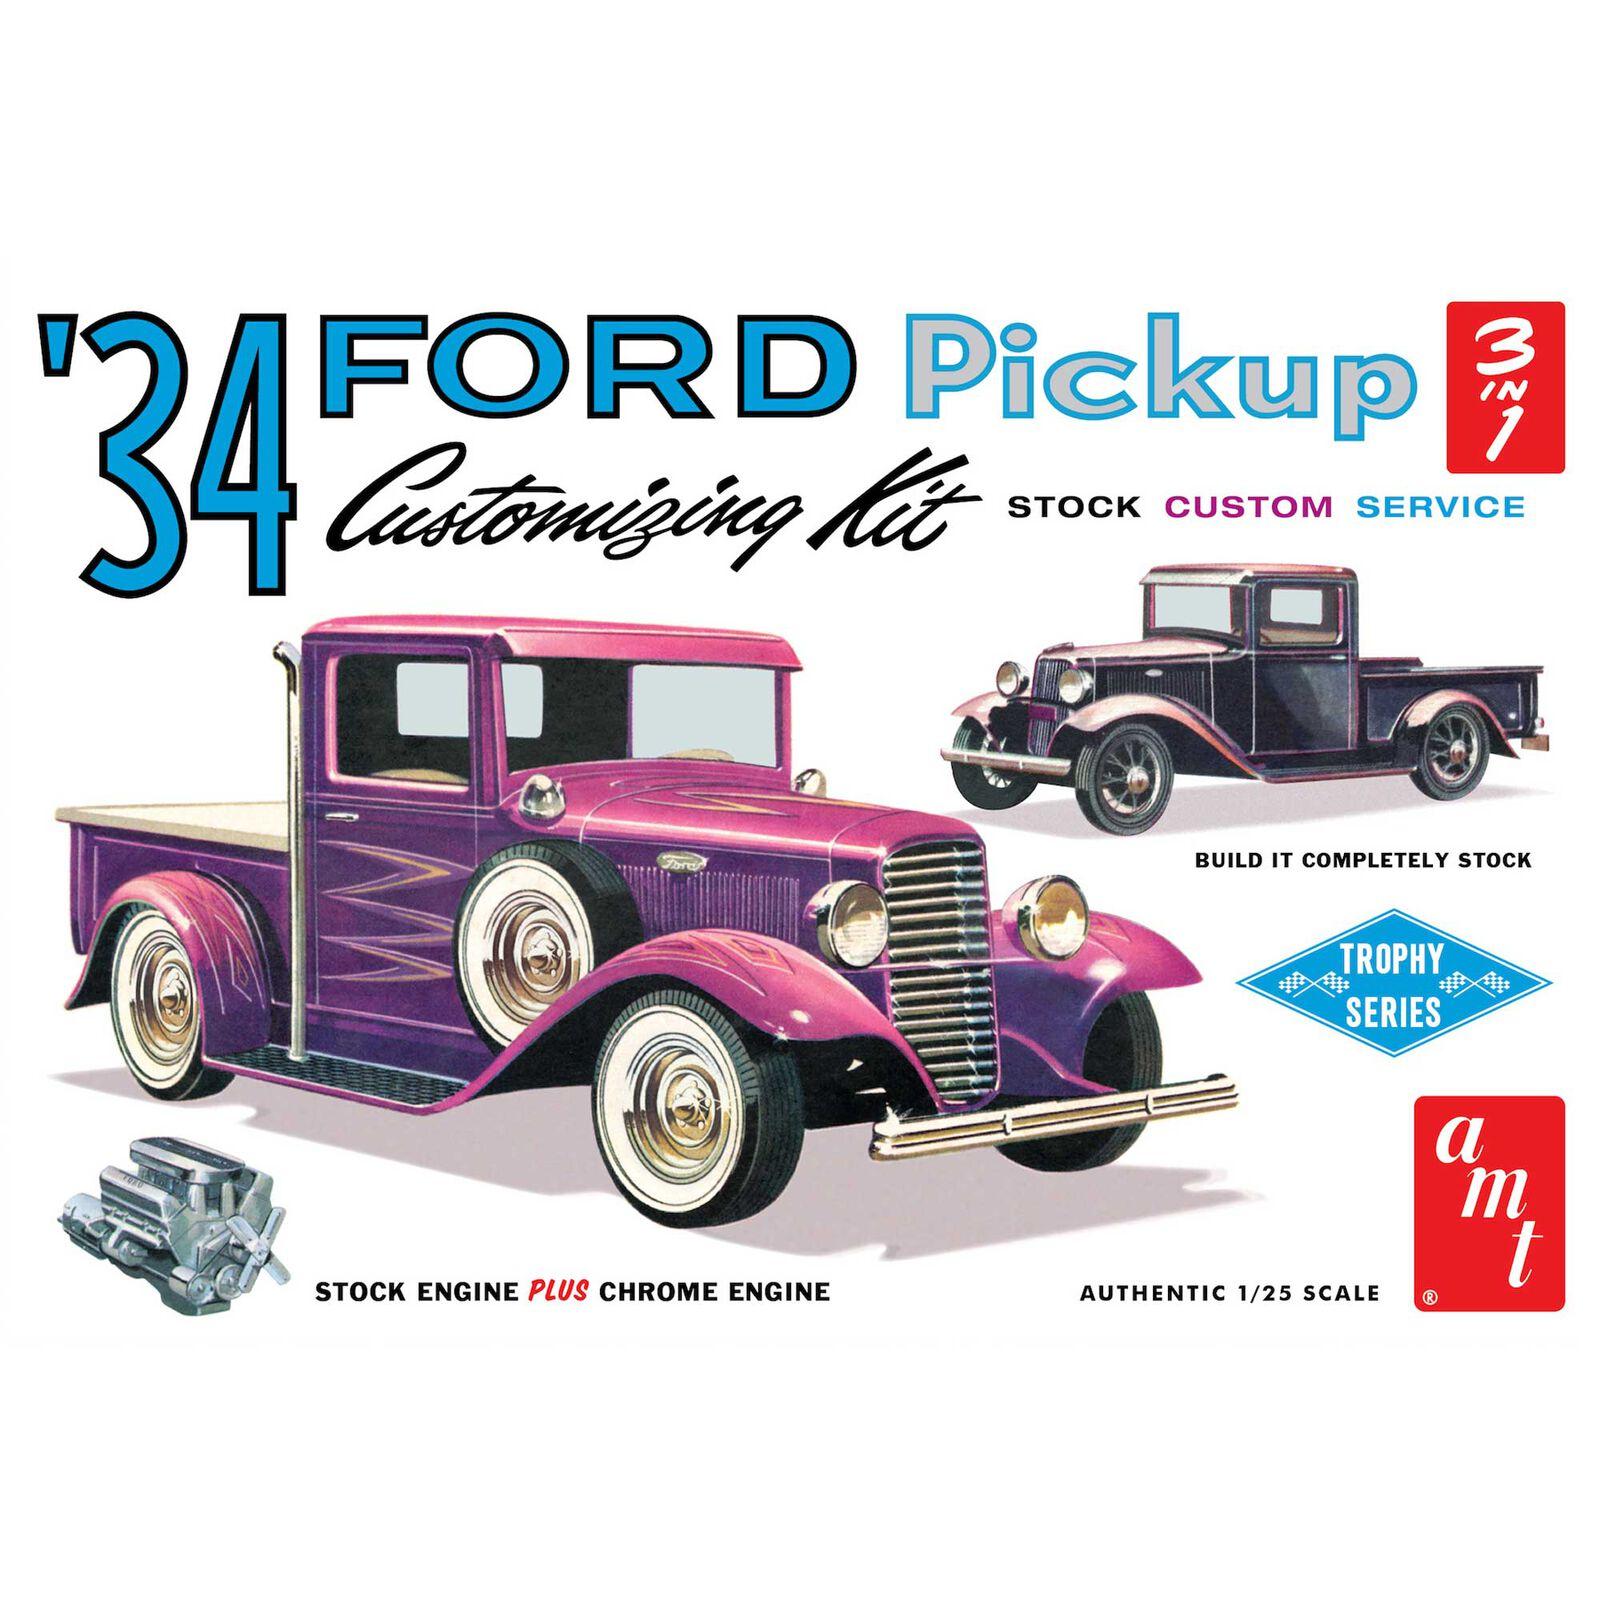 1/25 1934 Ford Pickup Model Kit